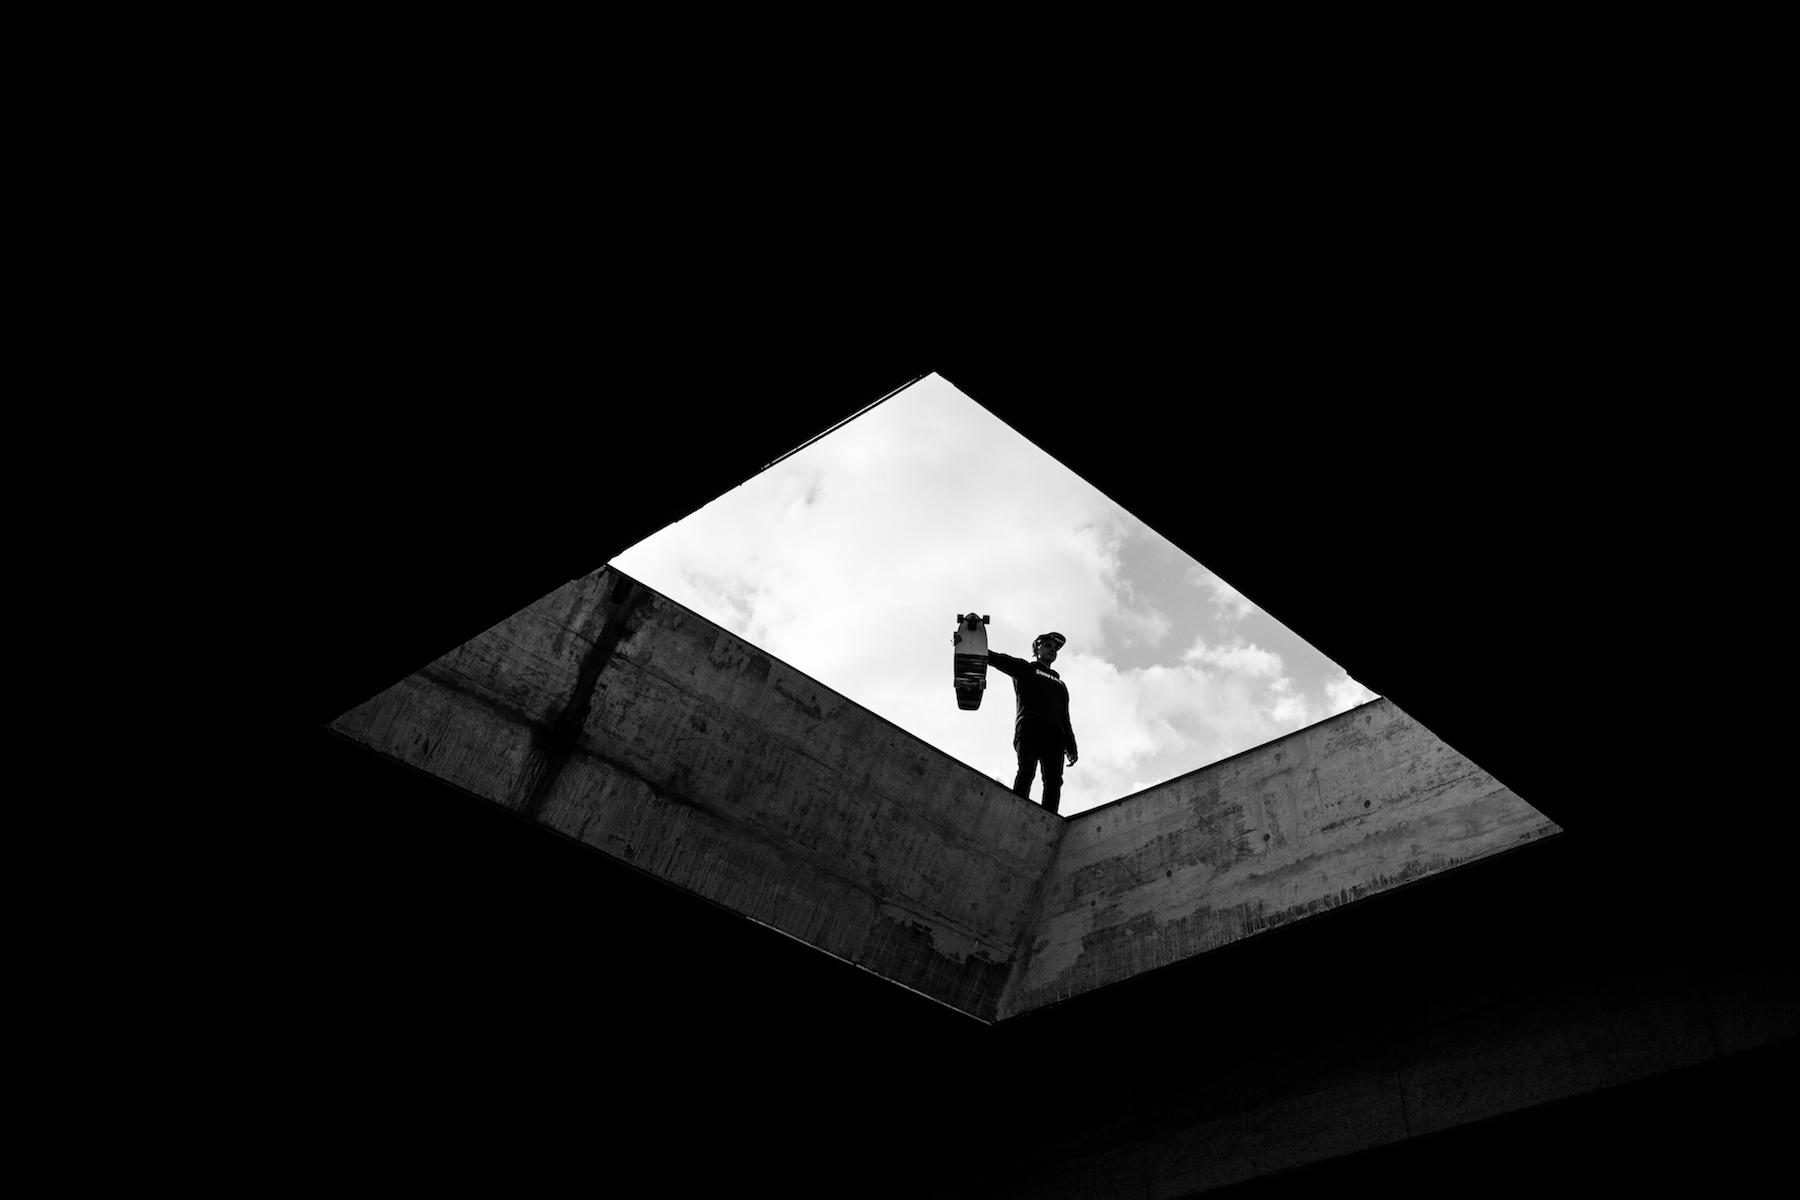 luke-paige-skate-photography-14